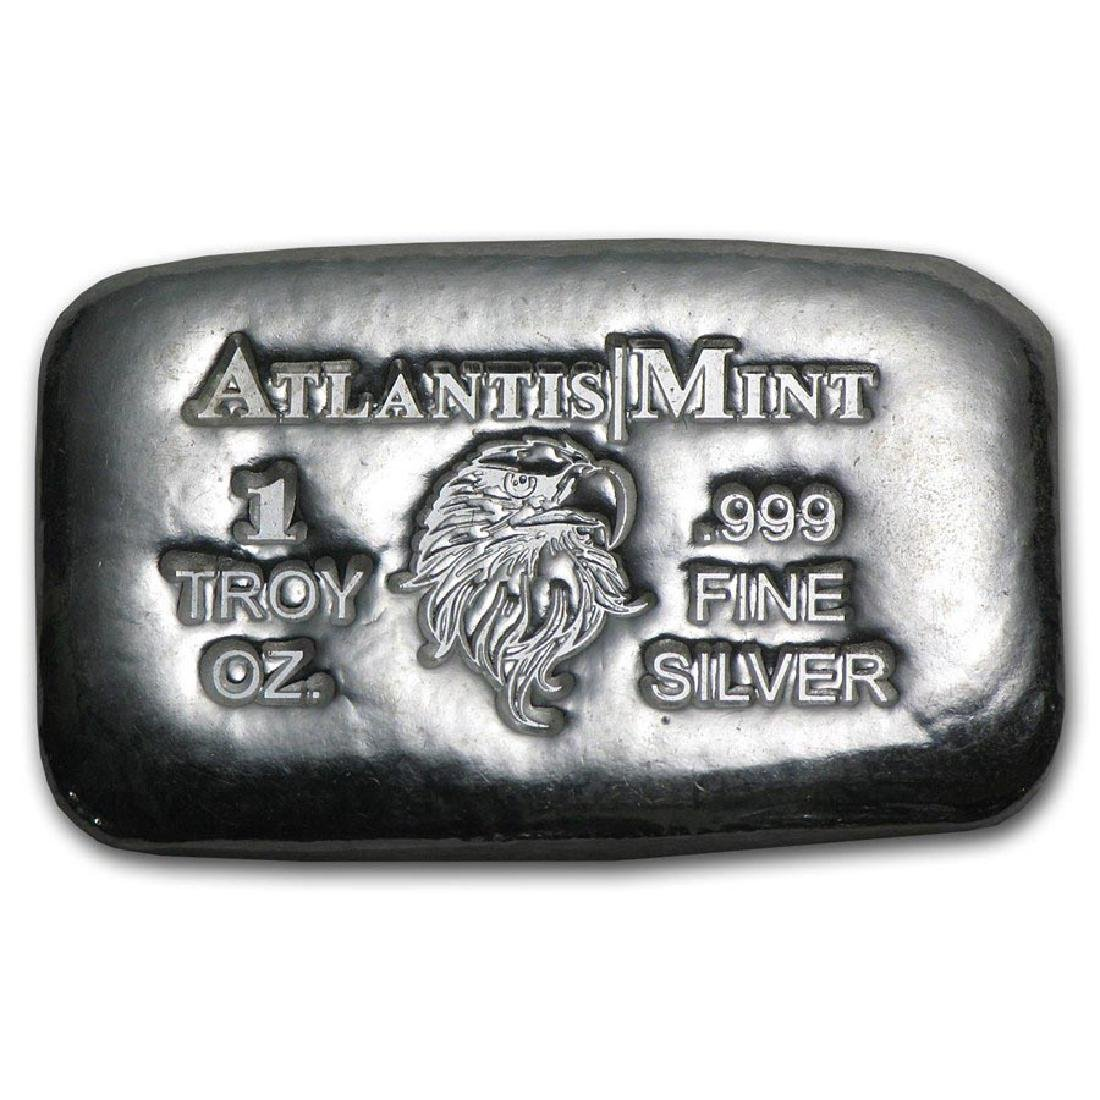 1 oz Silver Bar - Atlantis Mint (Eagle)